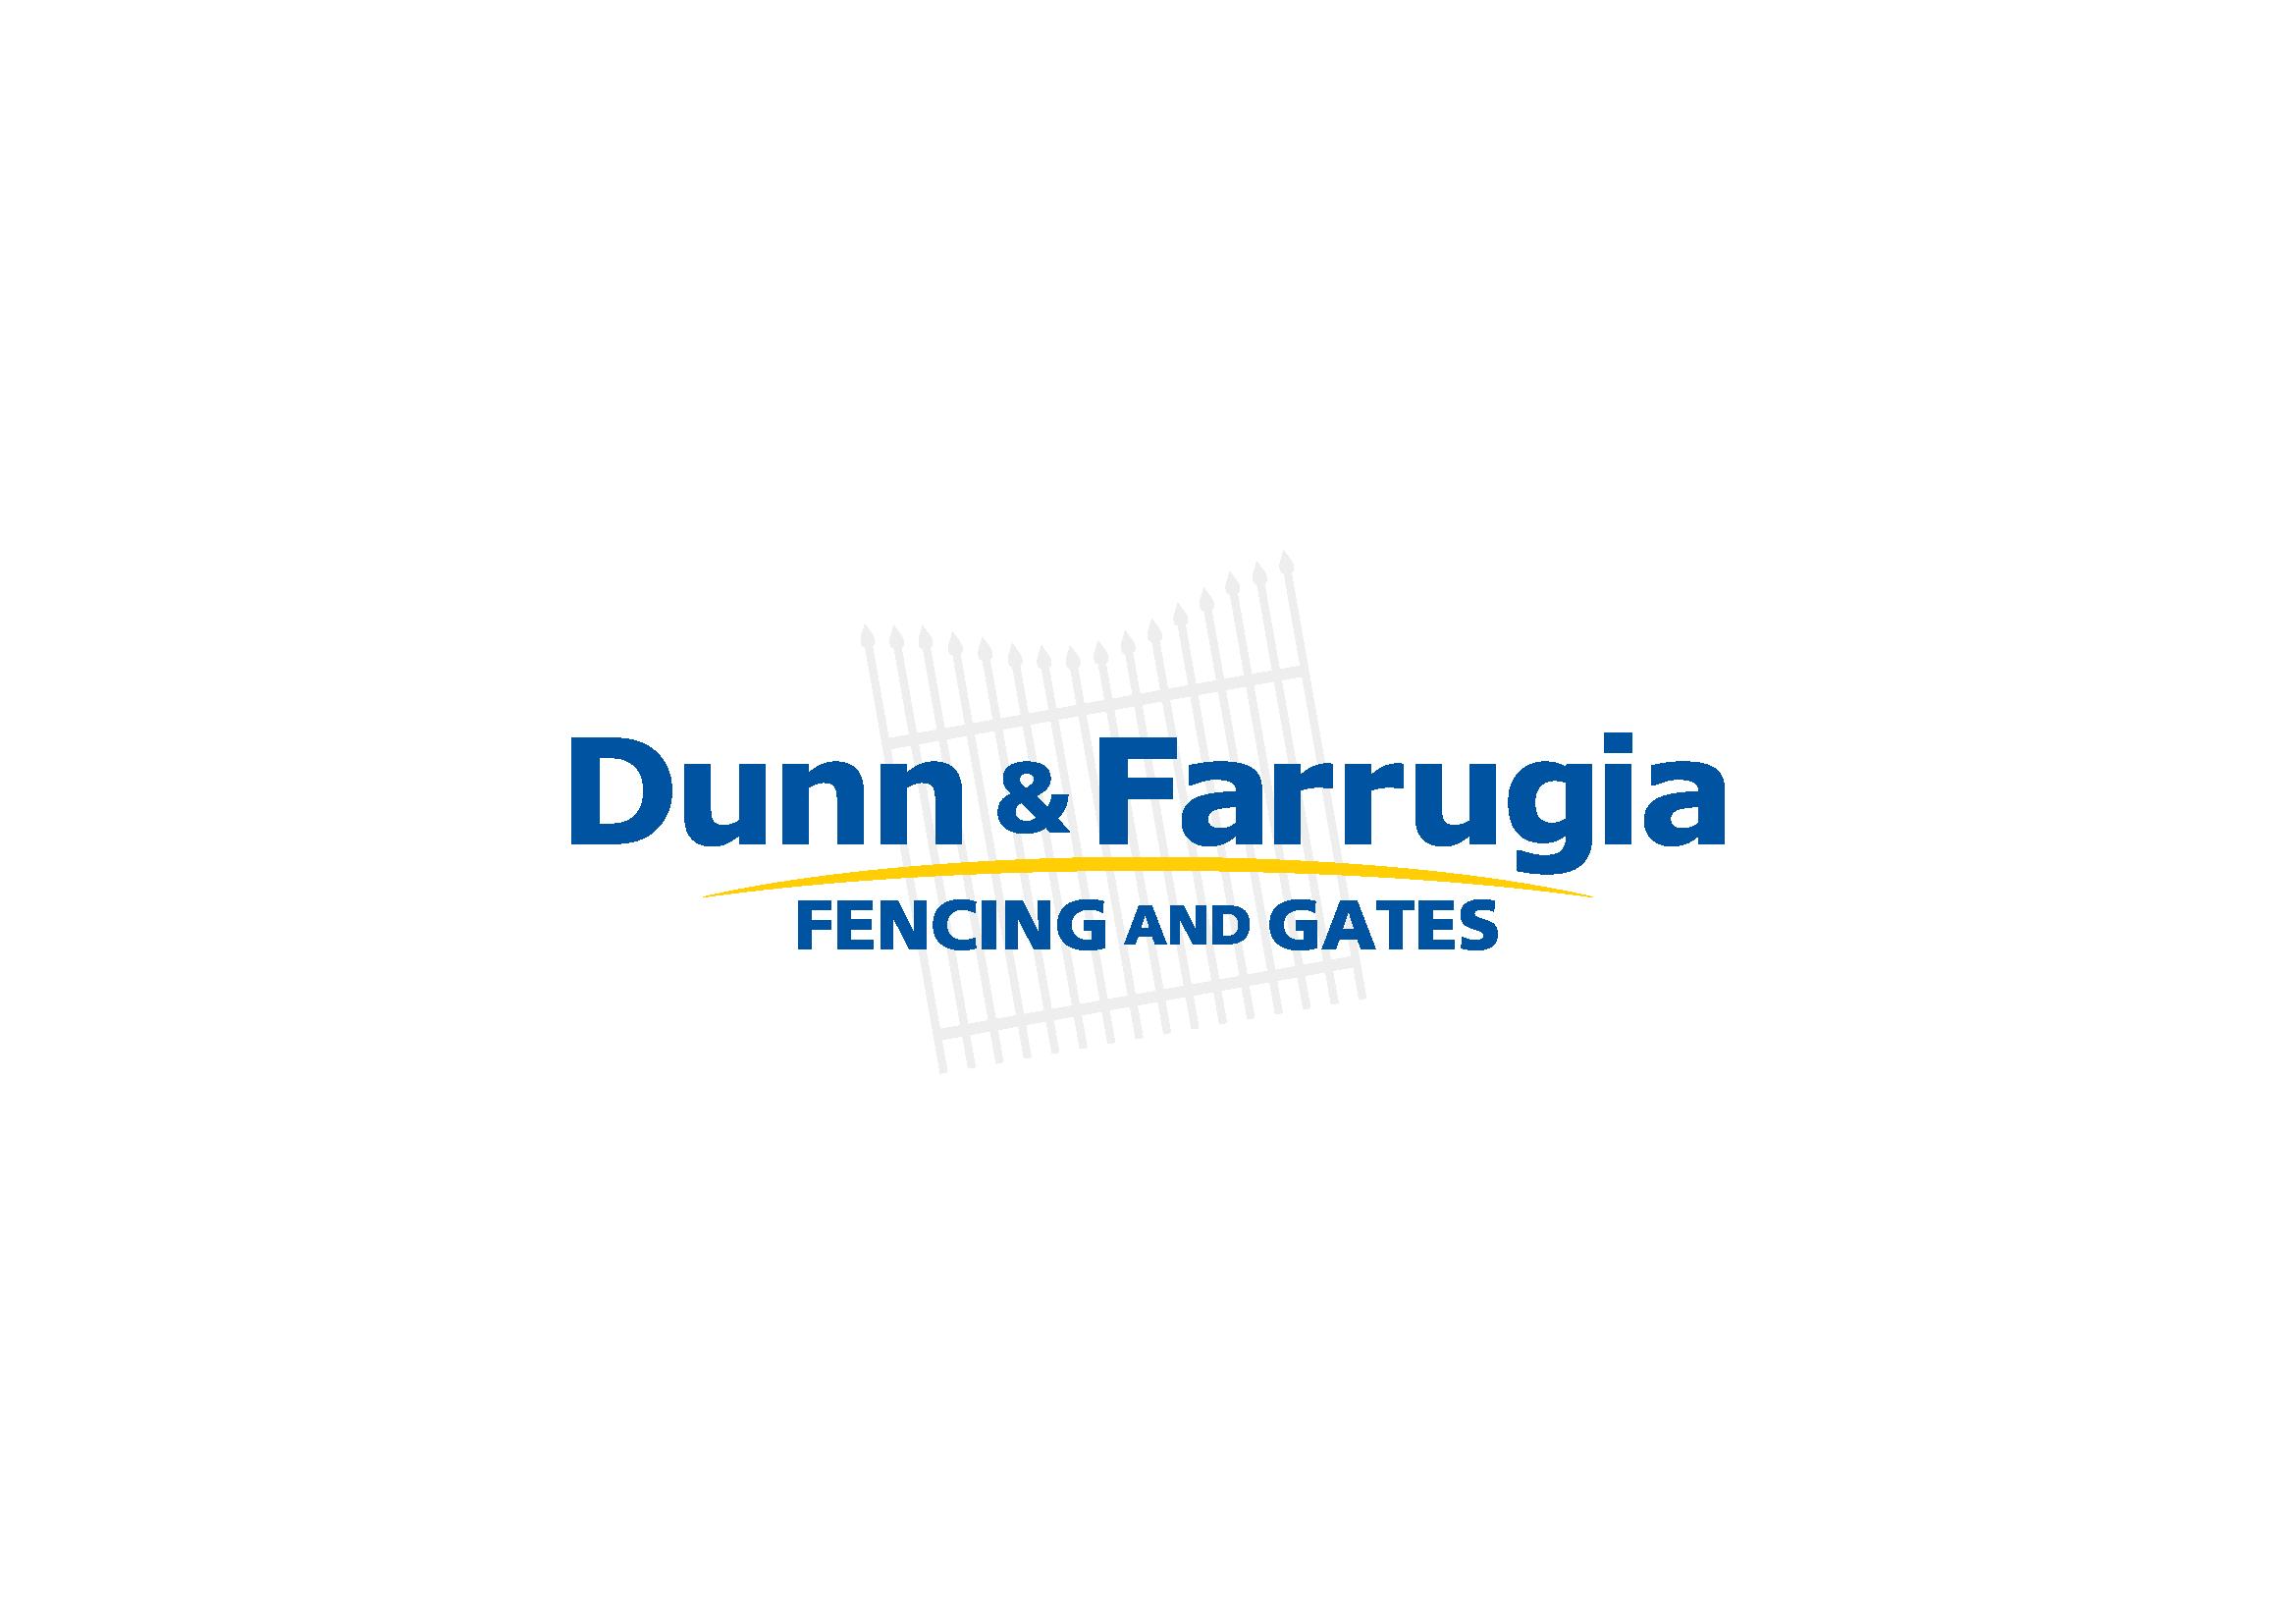 Dunn & Farrugia Fencing And Gates - Smeaton Grange, NSW 2567 - (02) 4647 2507 | ShowMeLocal.com